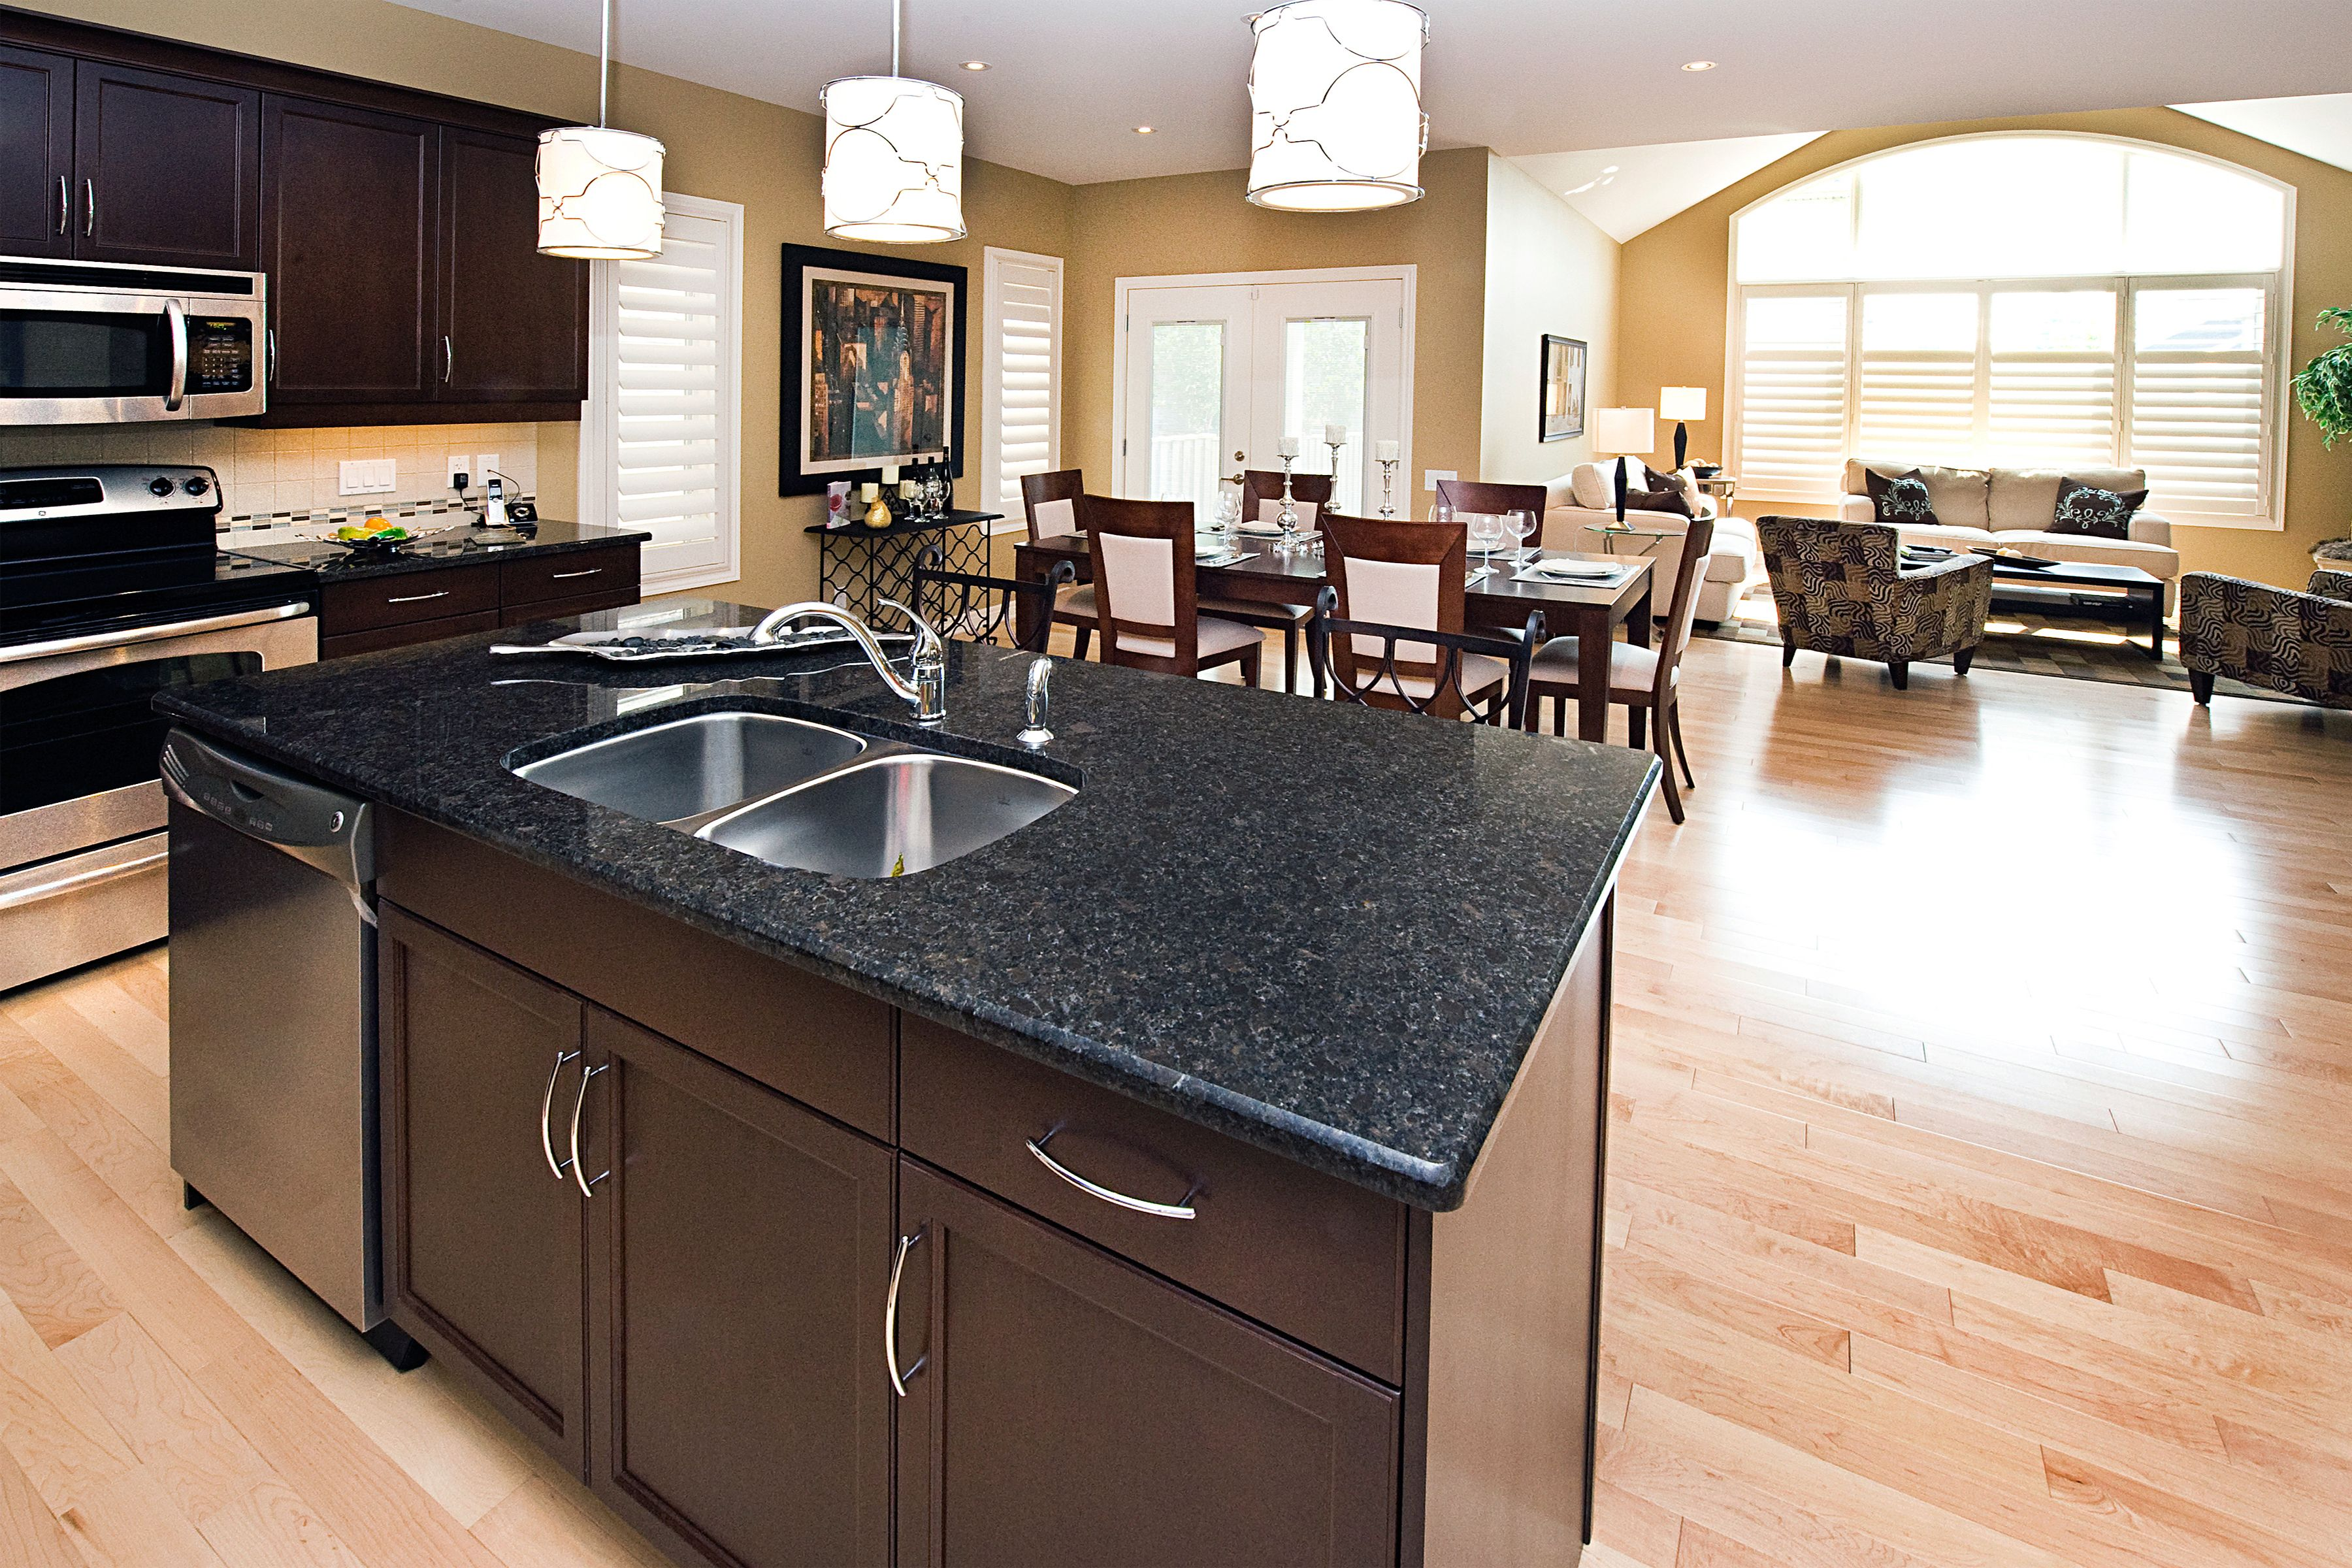 The Newport Kitchen   Granite Breakfast Bar, Pendant Lights, Hardwood  Floors, Large Windows